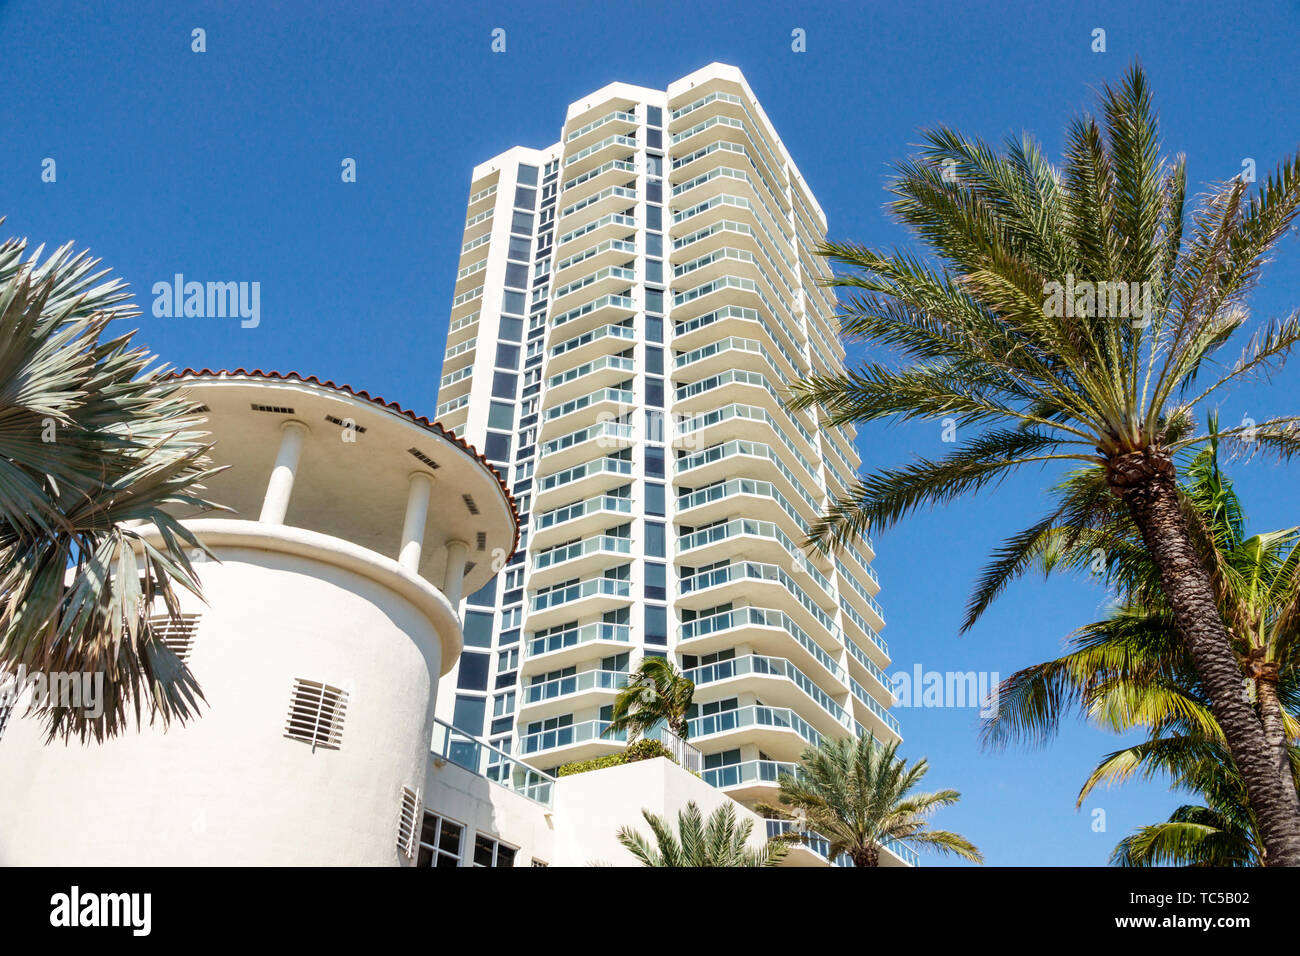 Miami Beach Florida North Beach Ocean Terrace St. Saint Tropez Ocean Front Condominium balconies high rise building Stock Photo